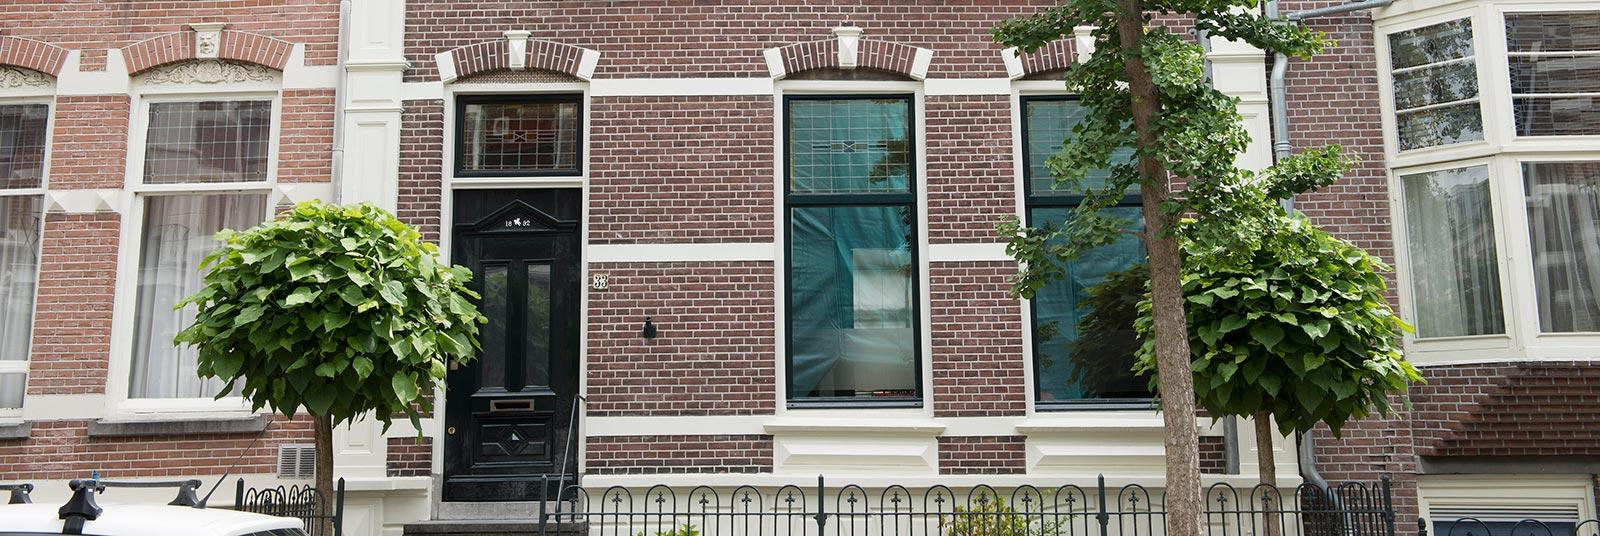 F.C. Donderstraat 33